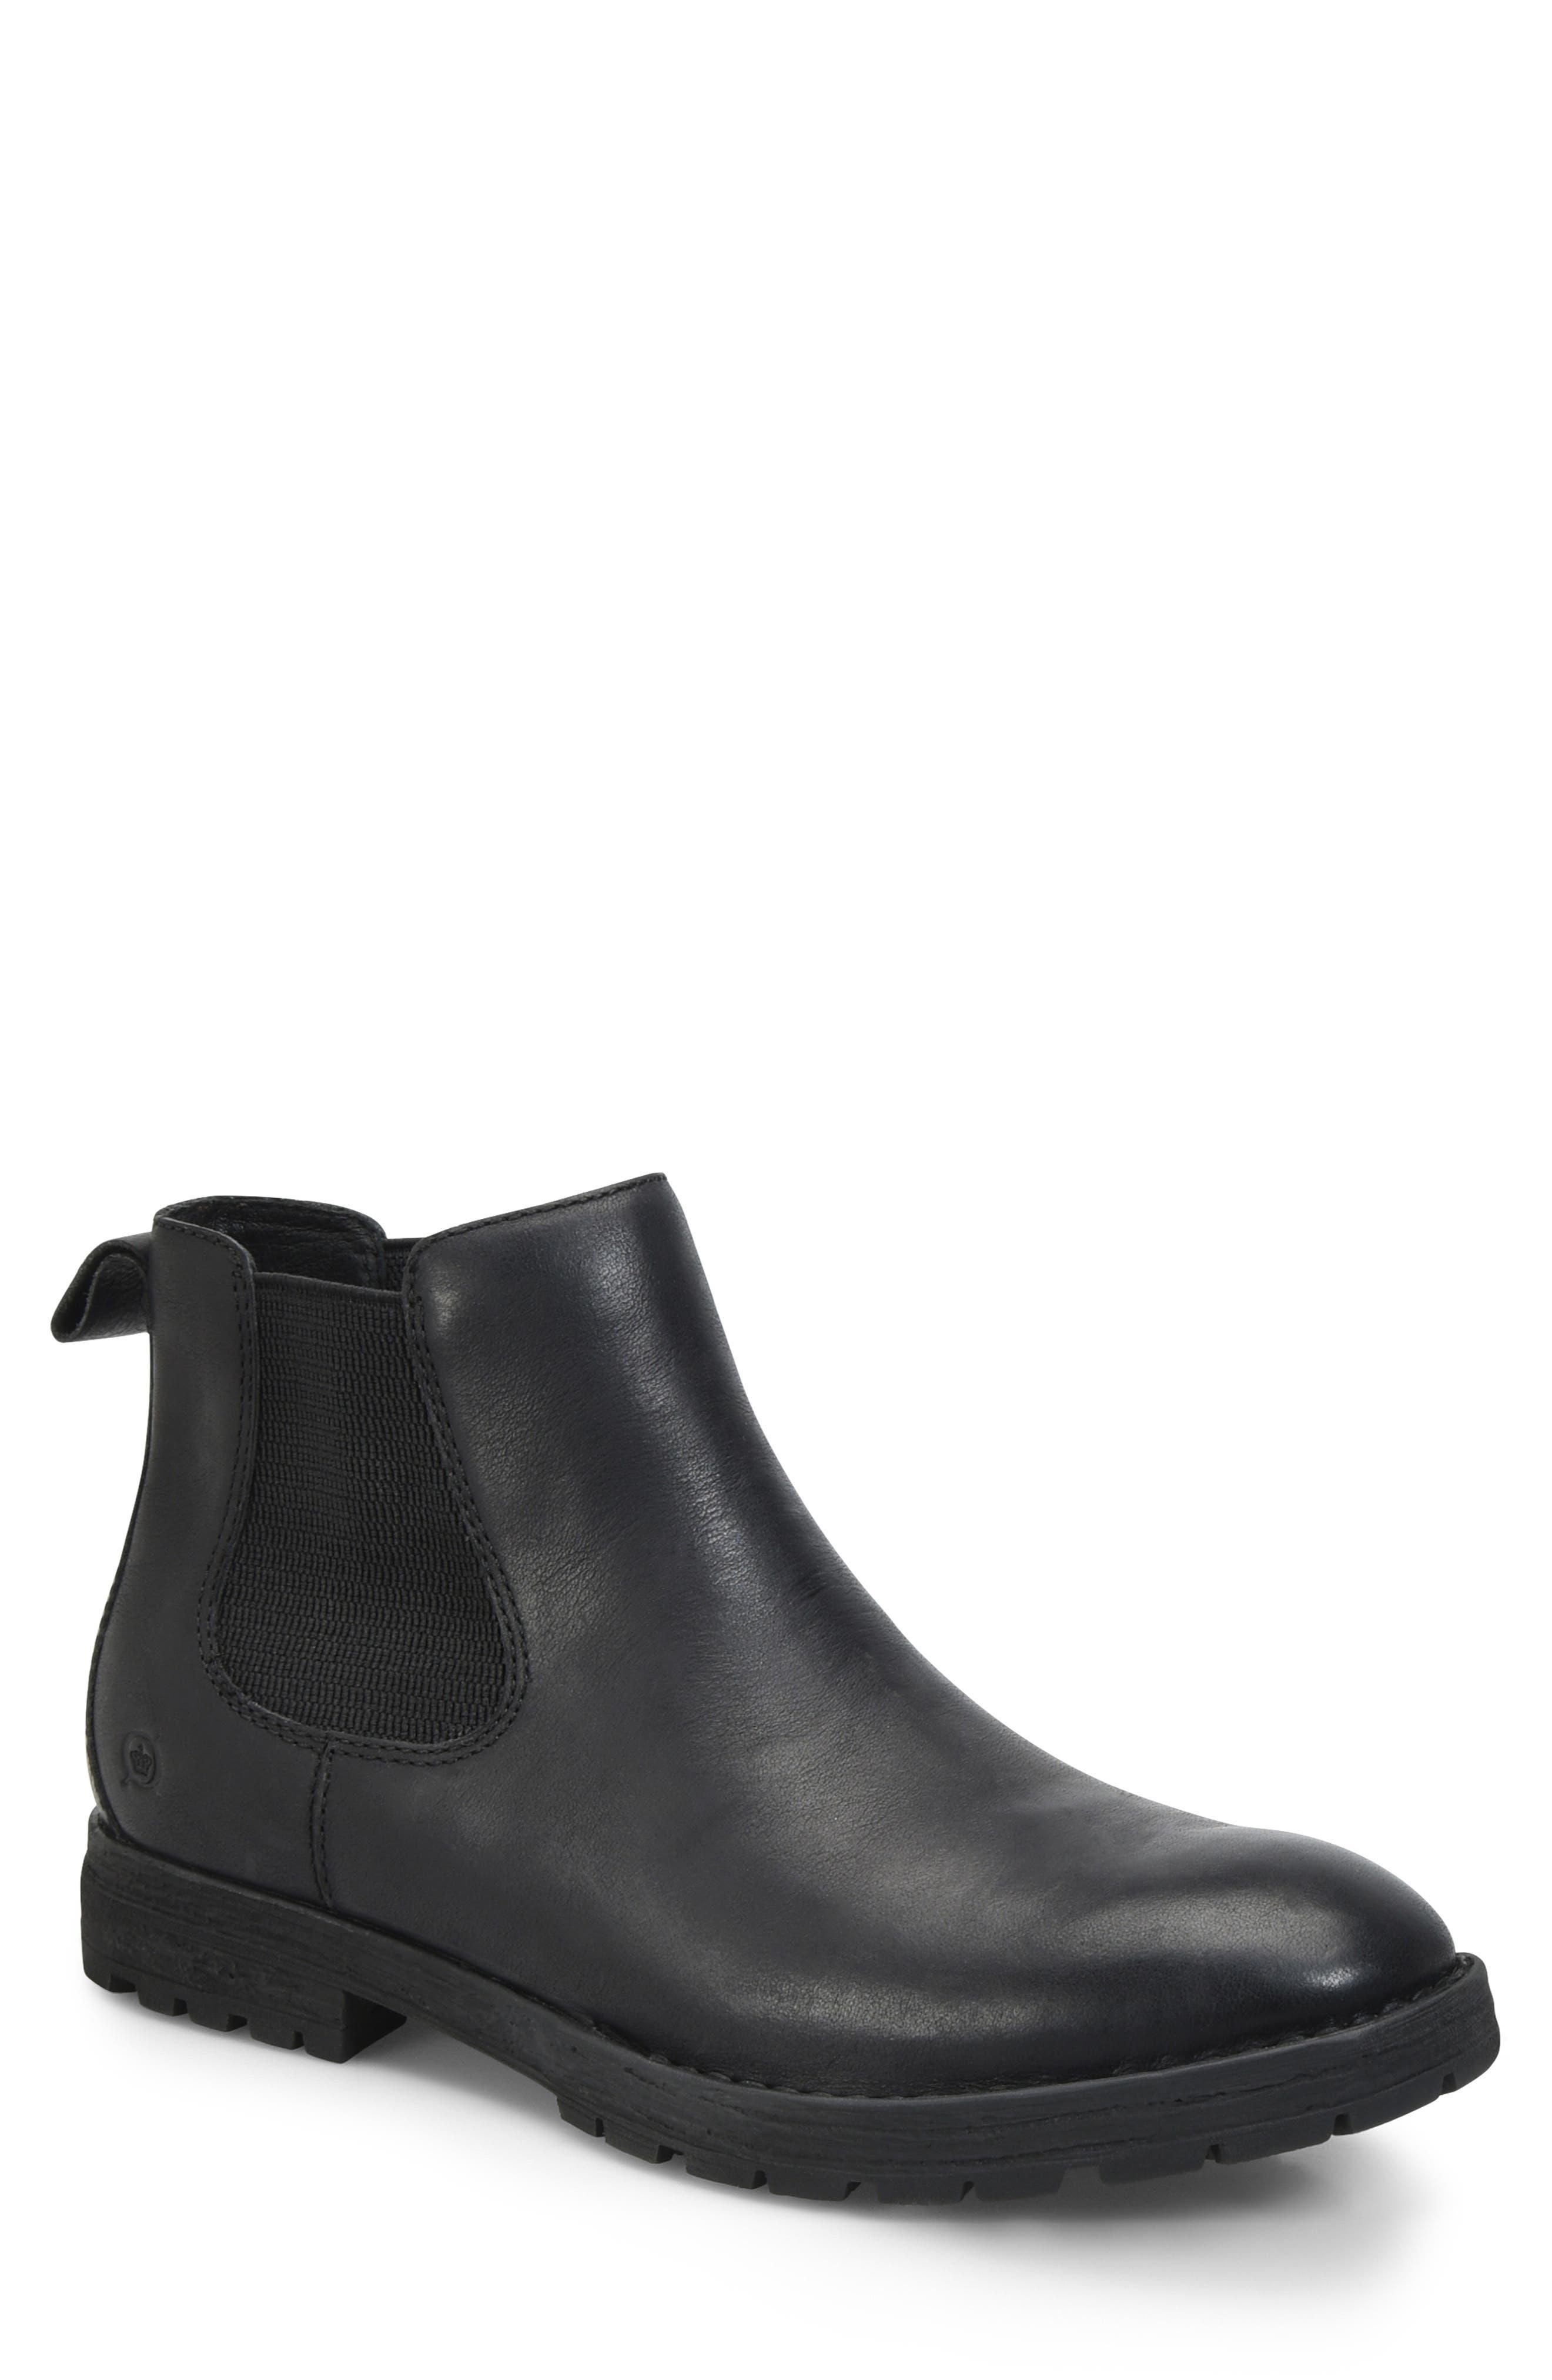 B?rn Luc Chelsea Boot- Black